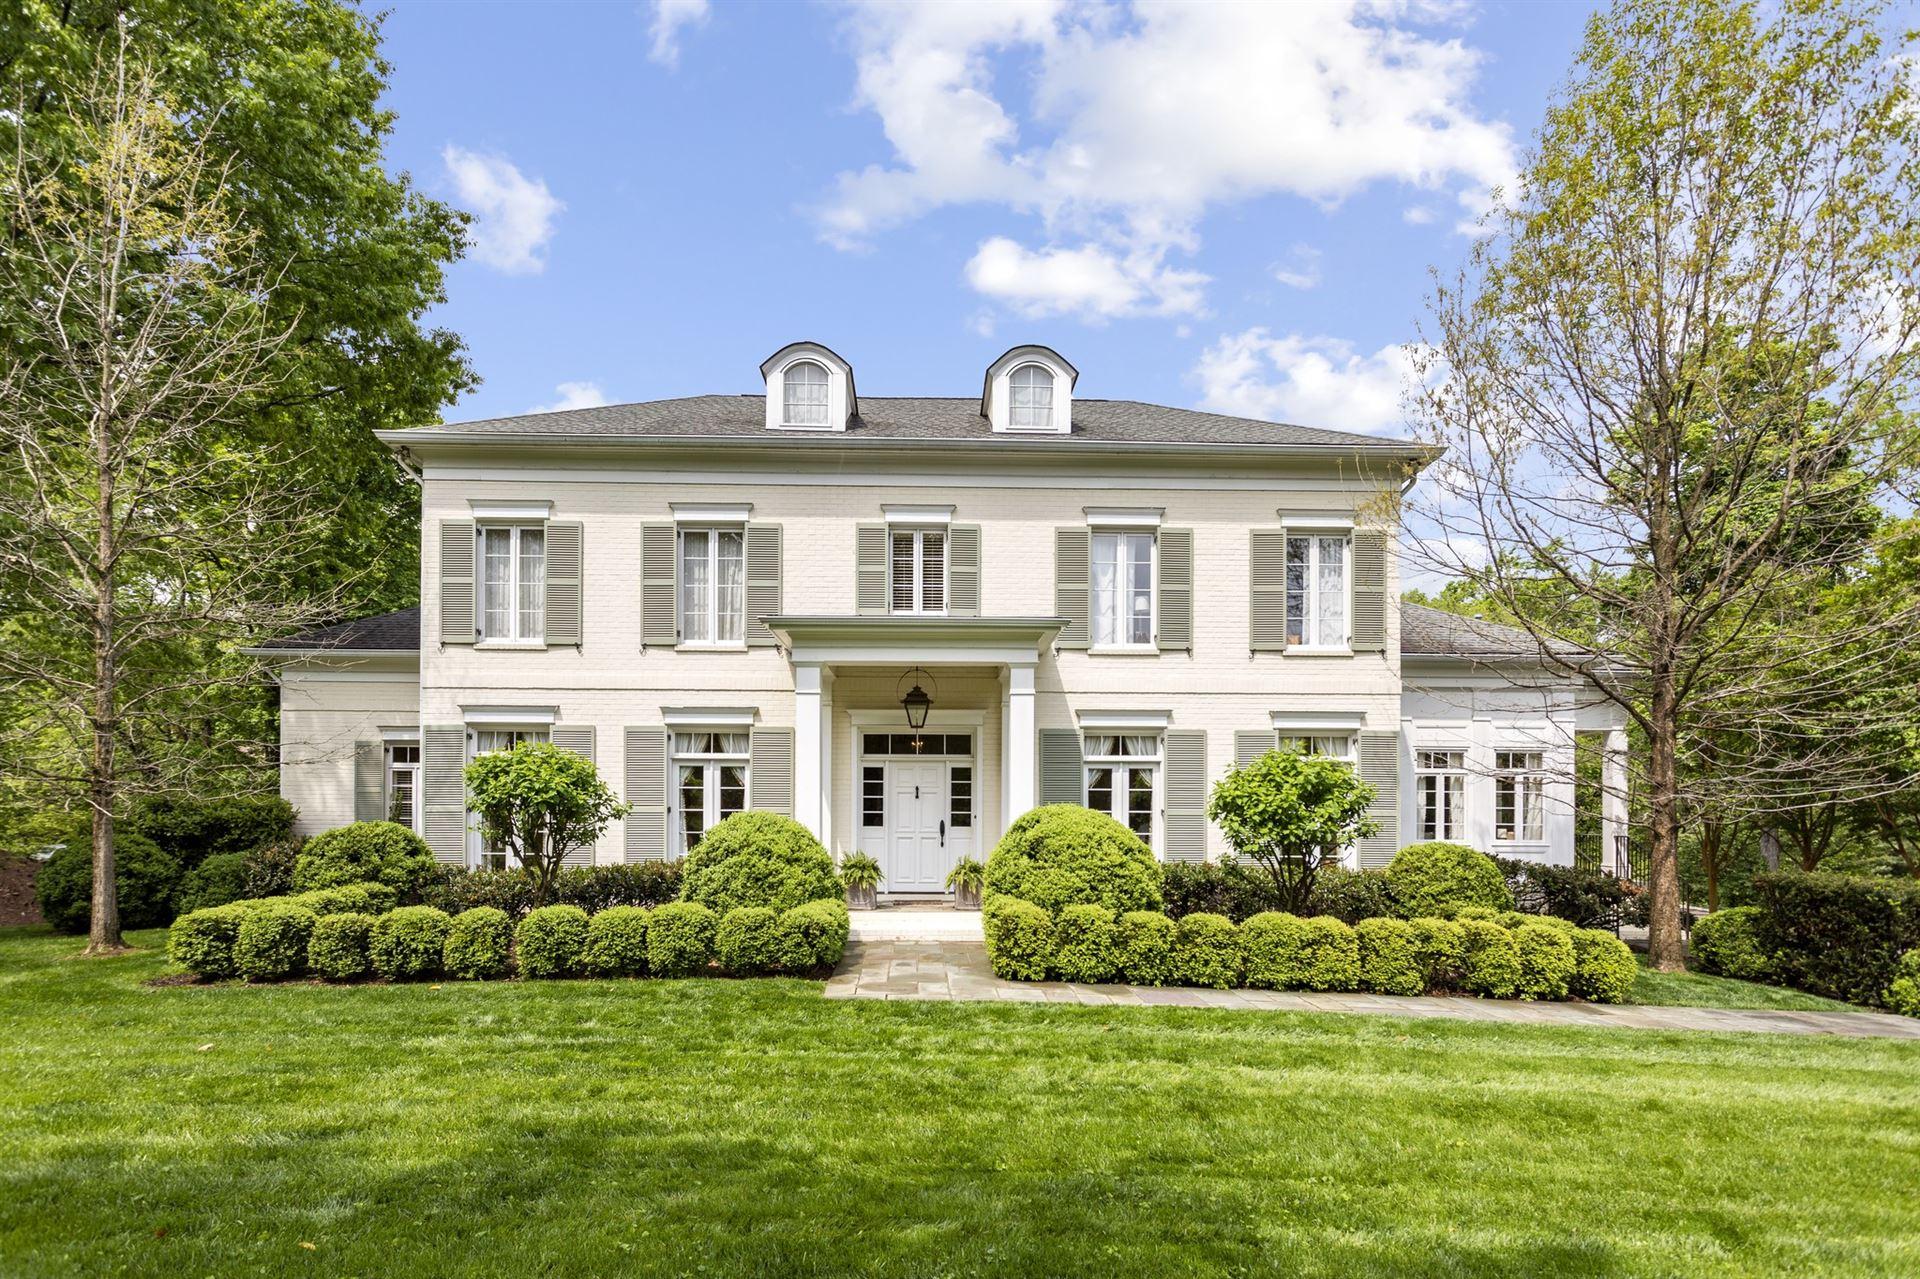 425 Royal Oaks Dr, Nashville, TN 37205 - MLS#: 2253790